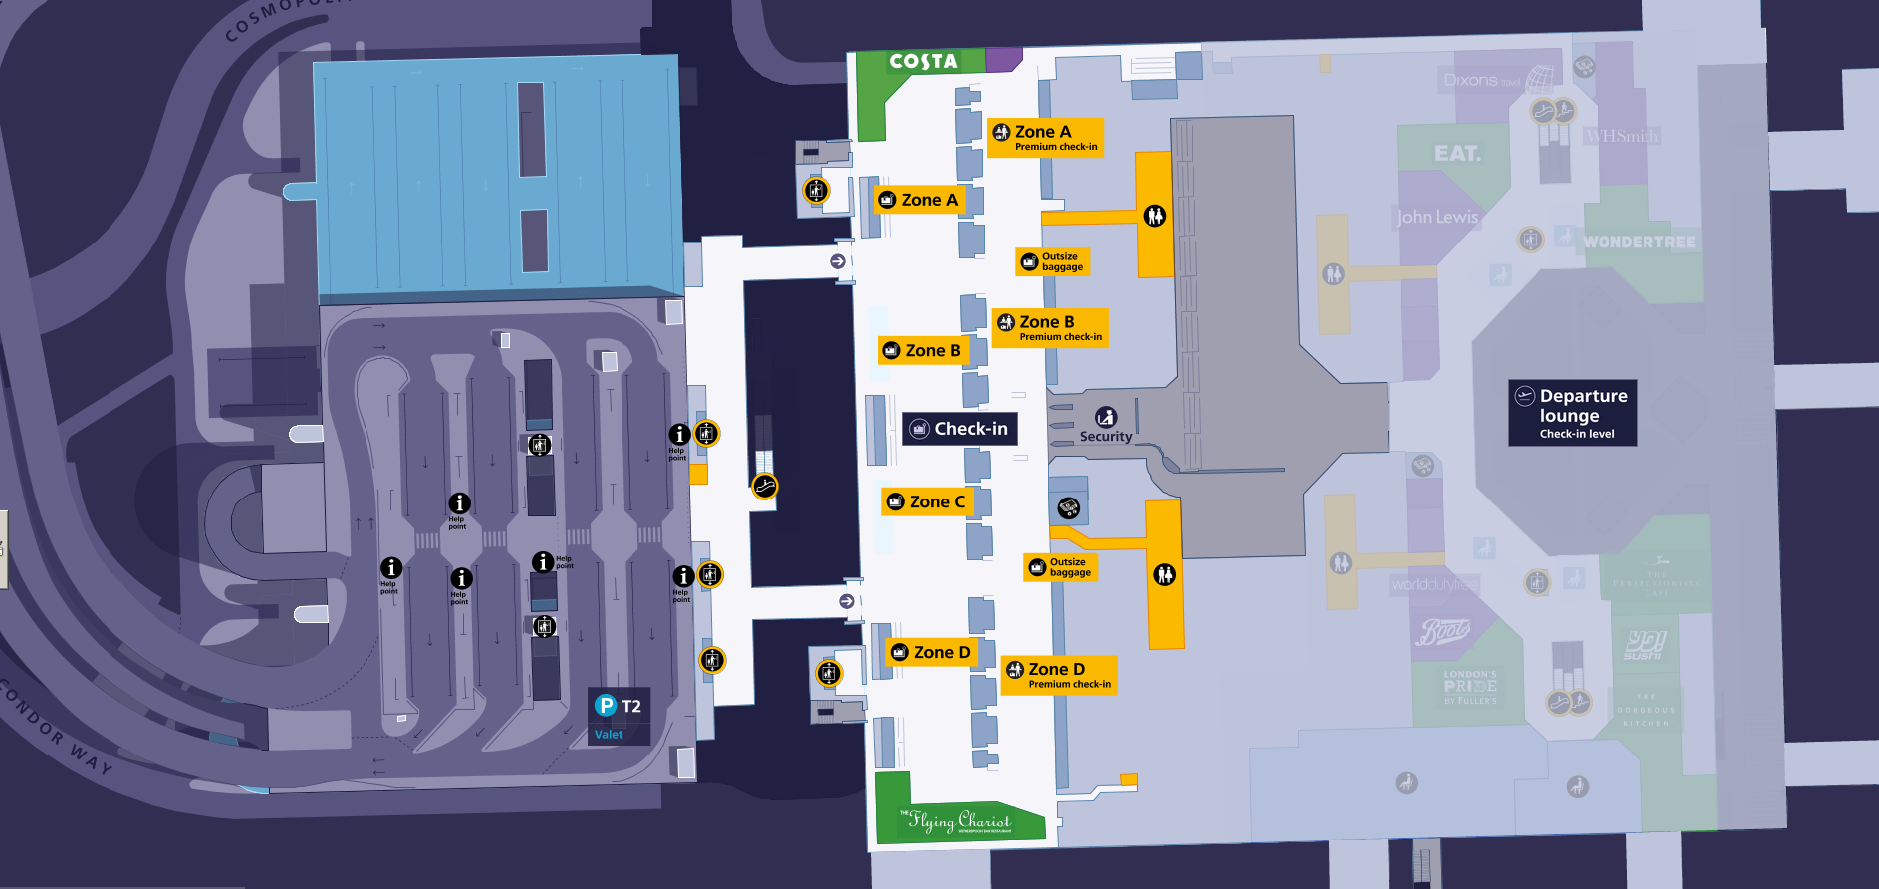 Heathrow Terminal 2 Map TERMINAL 2 MAP » Heathrow Taxis